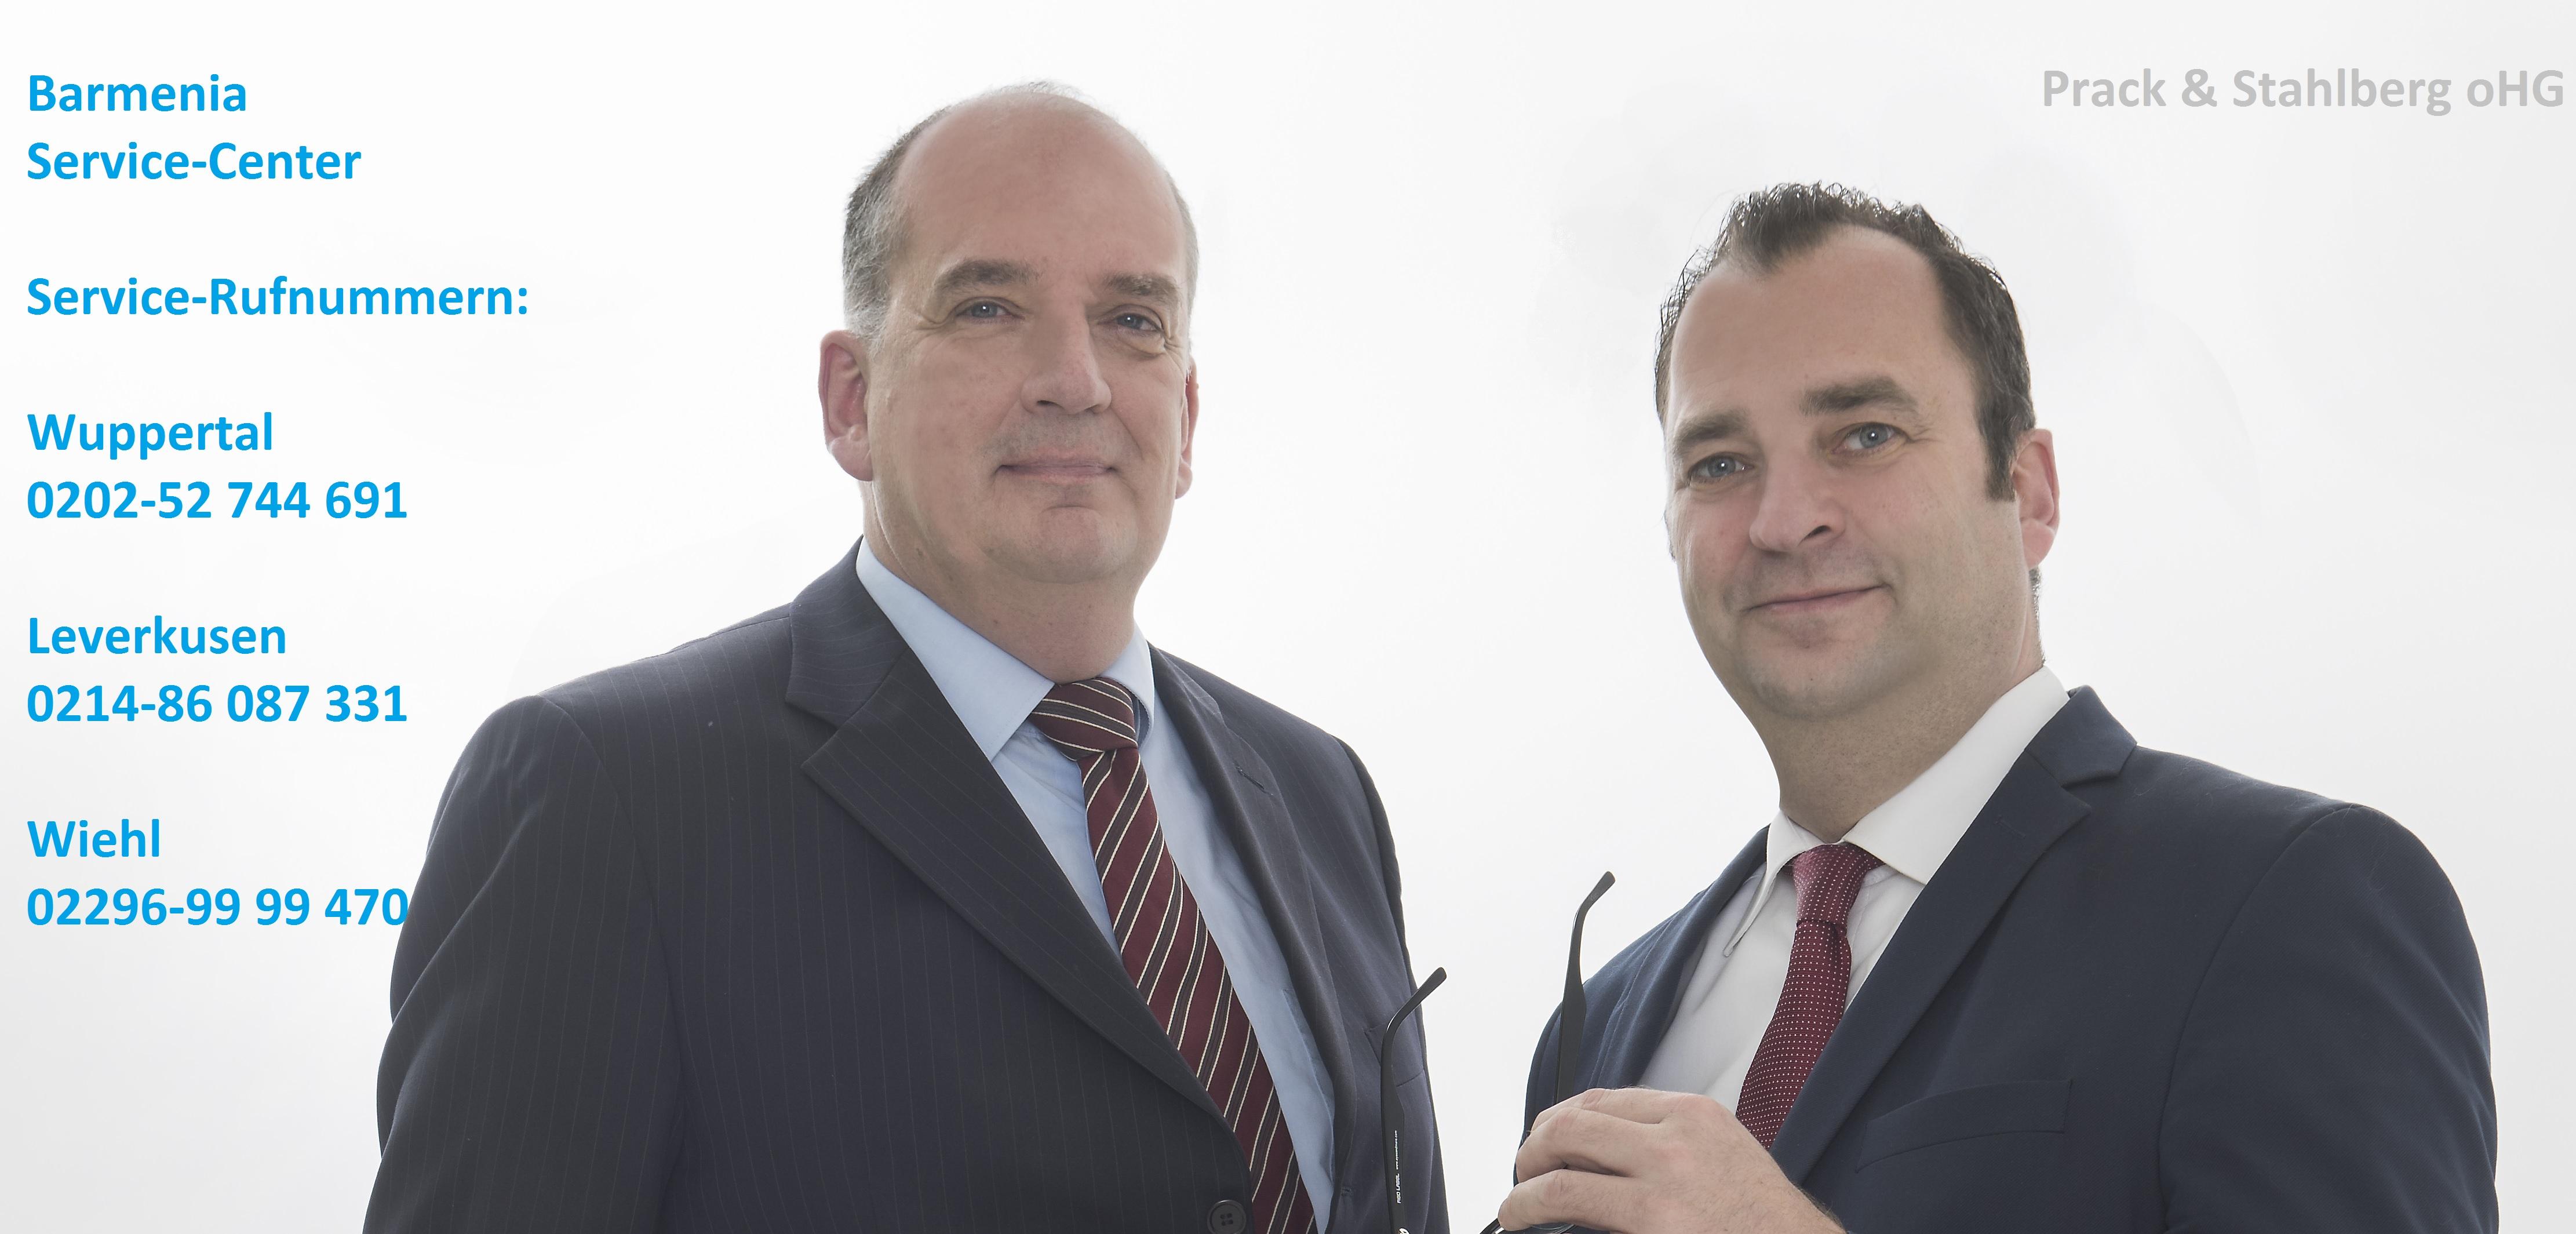 Barmenia Versicherung - Prack & Stahlberg oHG